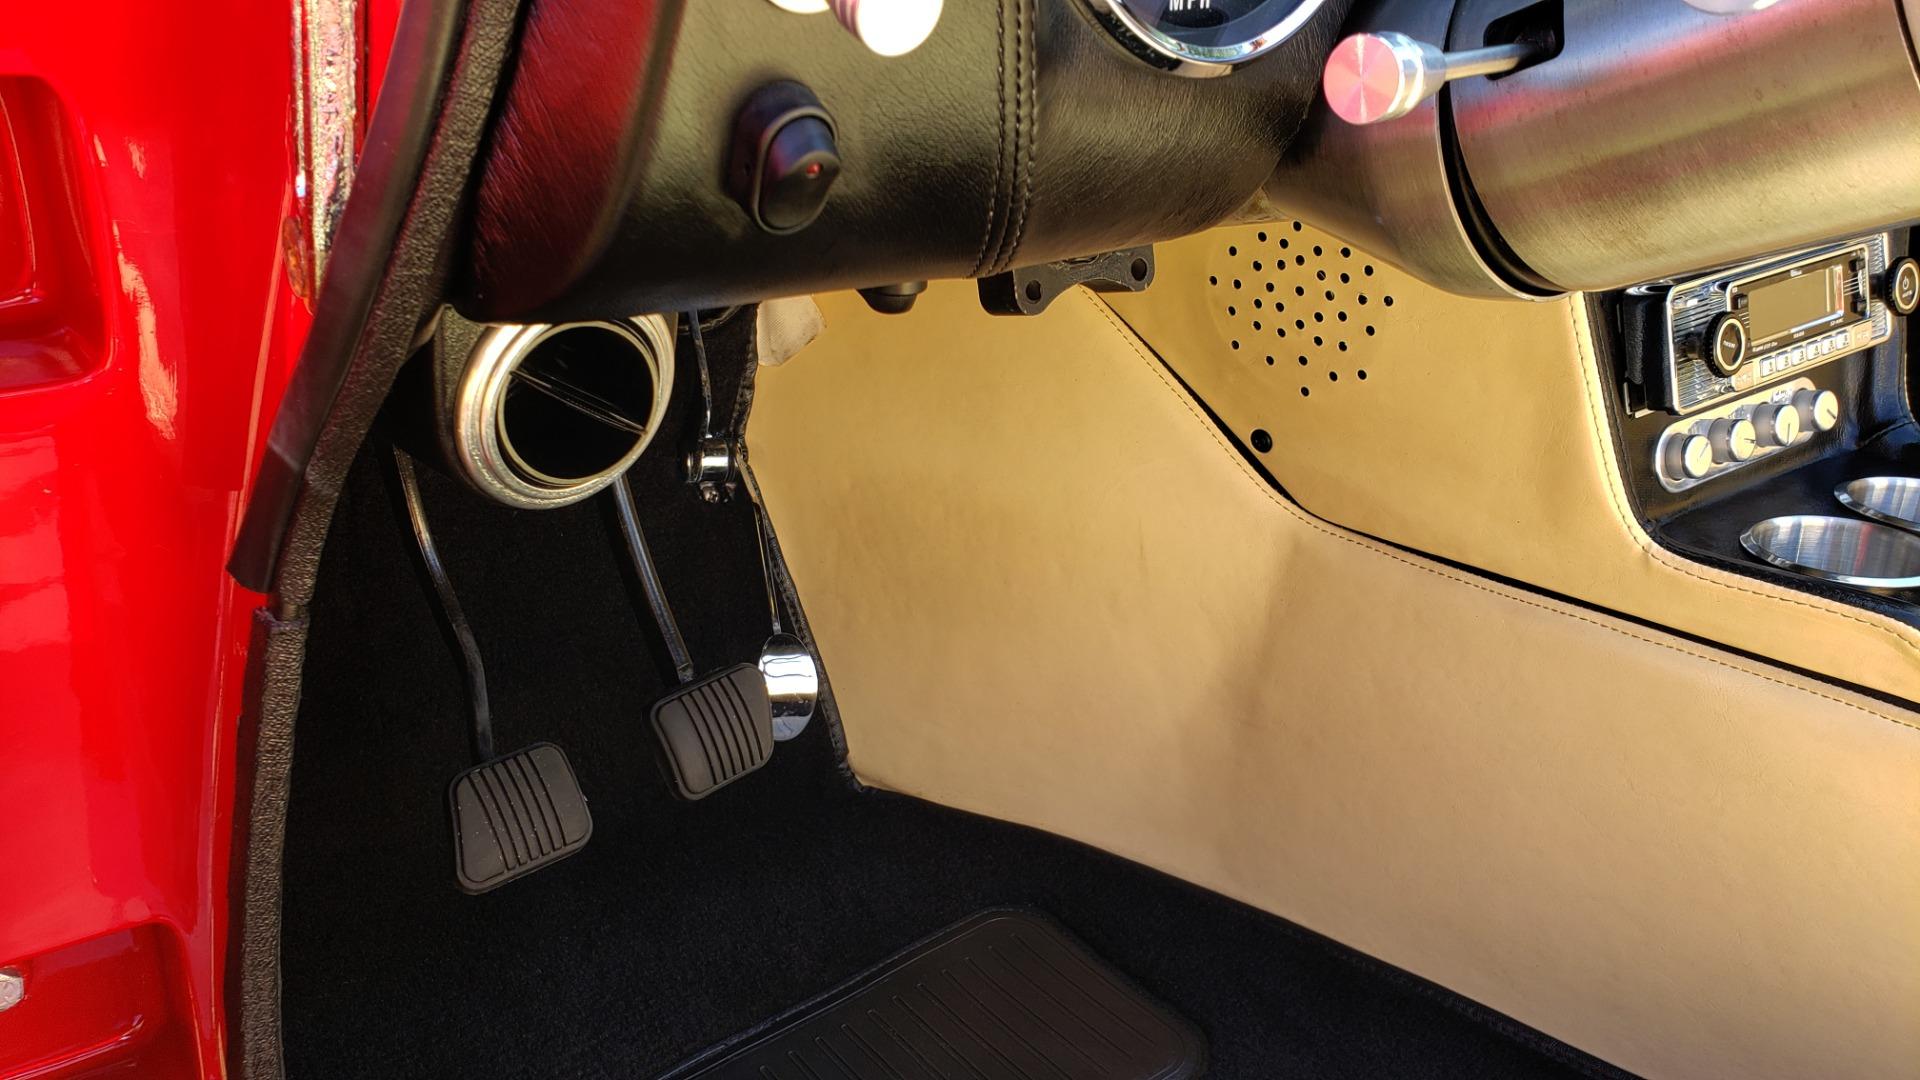 Used 1961 Ferrari 250GT SWB CALIFORNIA REPLICA / 302CI V8 / TREMEC 5-SPEED for sale Sold at Formula Imports in Charlotte NC 28227 40